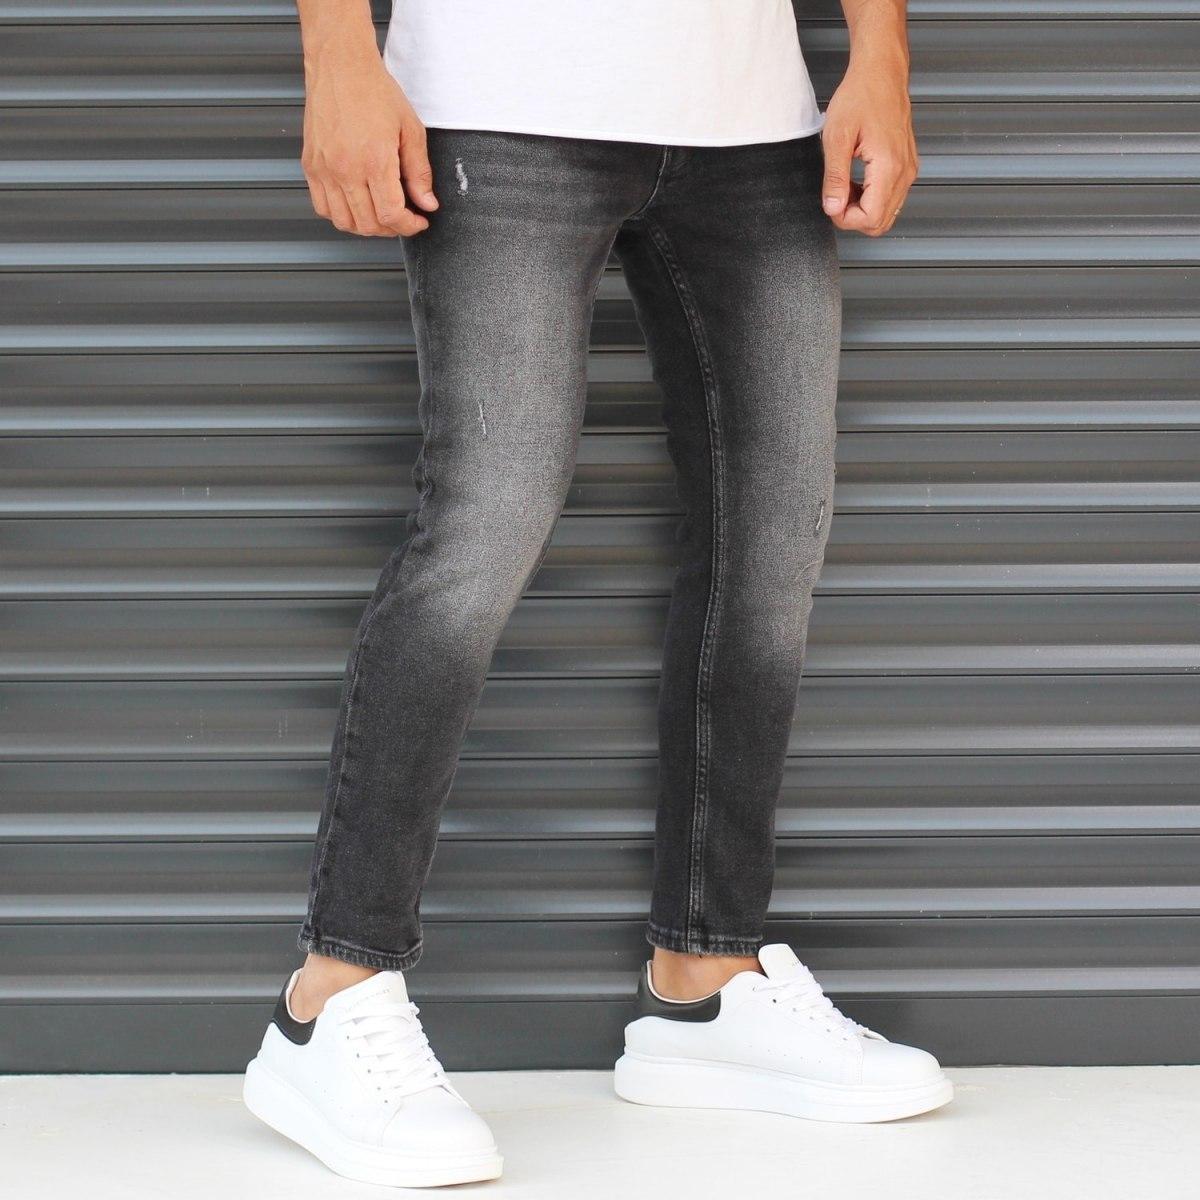 Men's Basic Stonewashed Jeans In Black Mv Premium Brand - 1